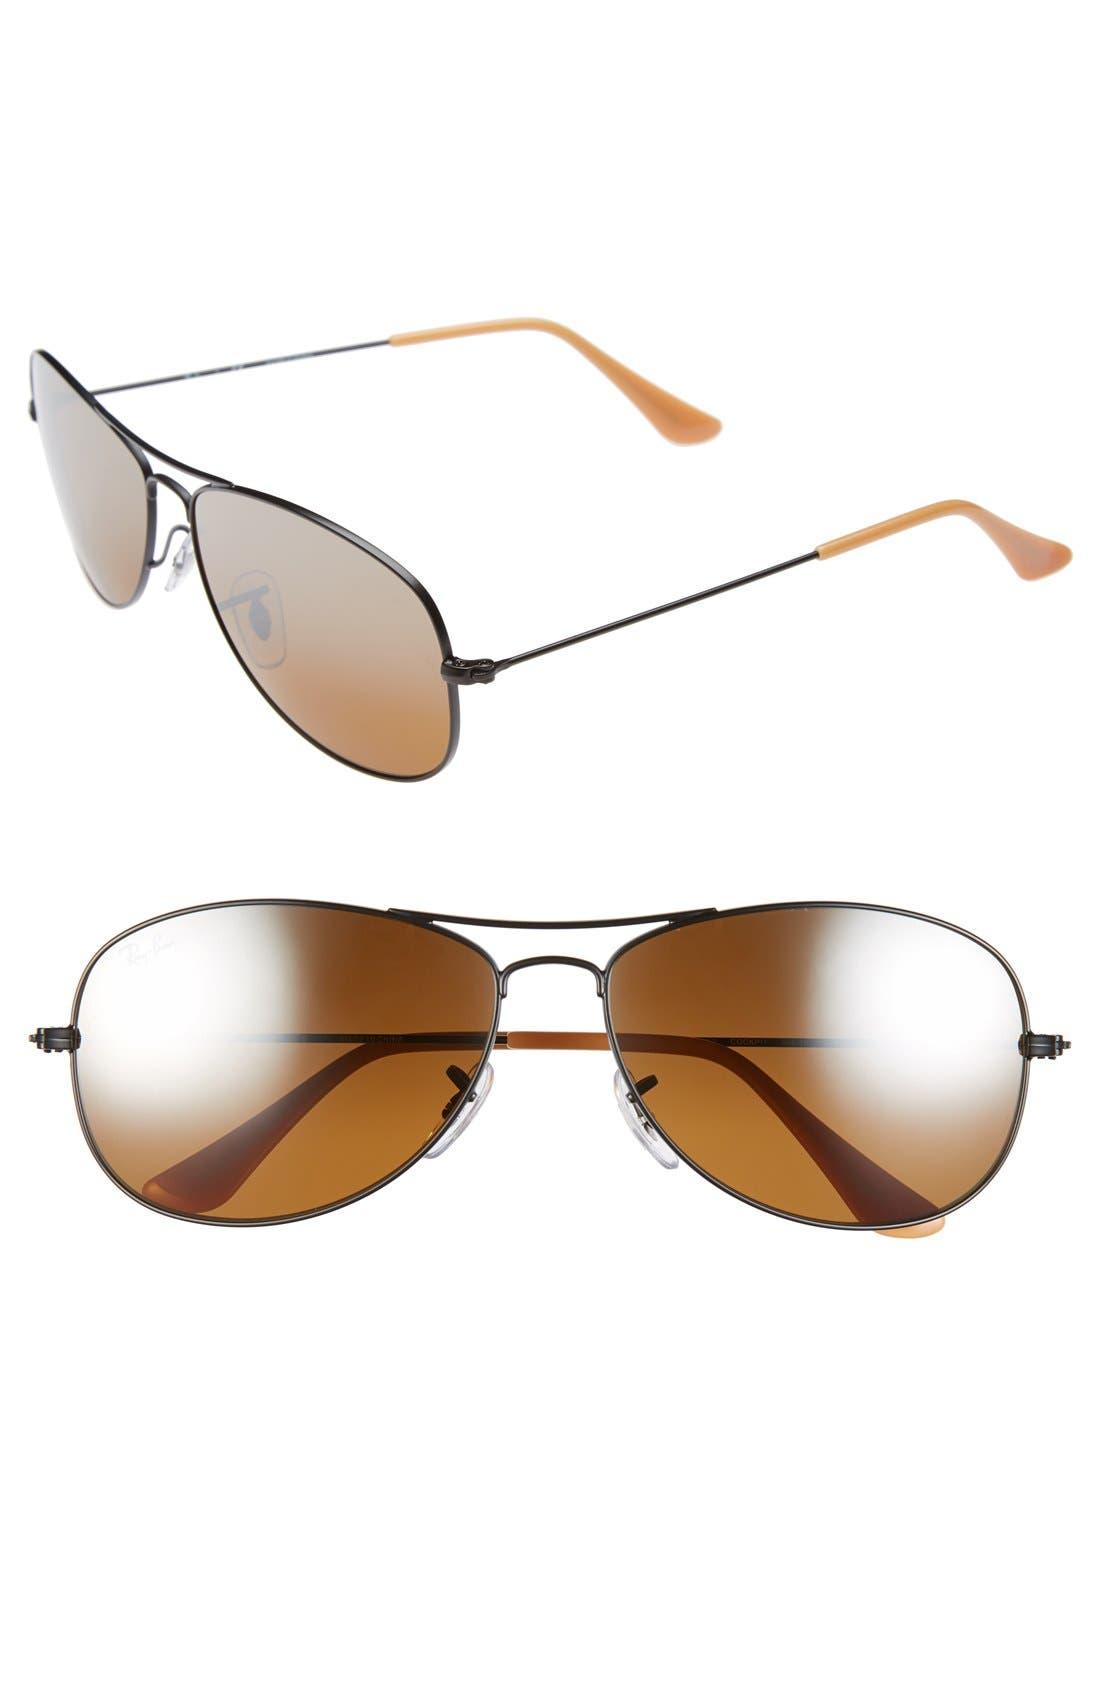 'New Classic' 59mm Aviator Sunglasses,                             Main thumbnail 1, color,                             200